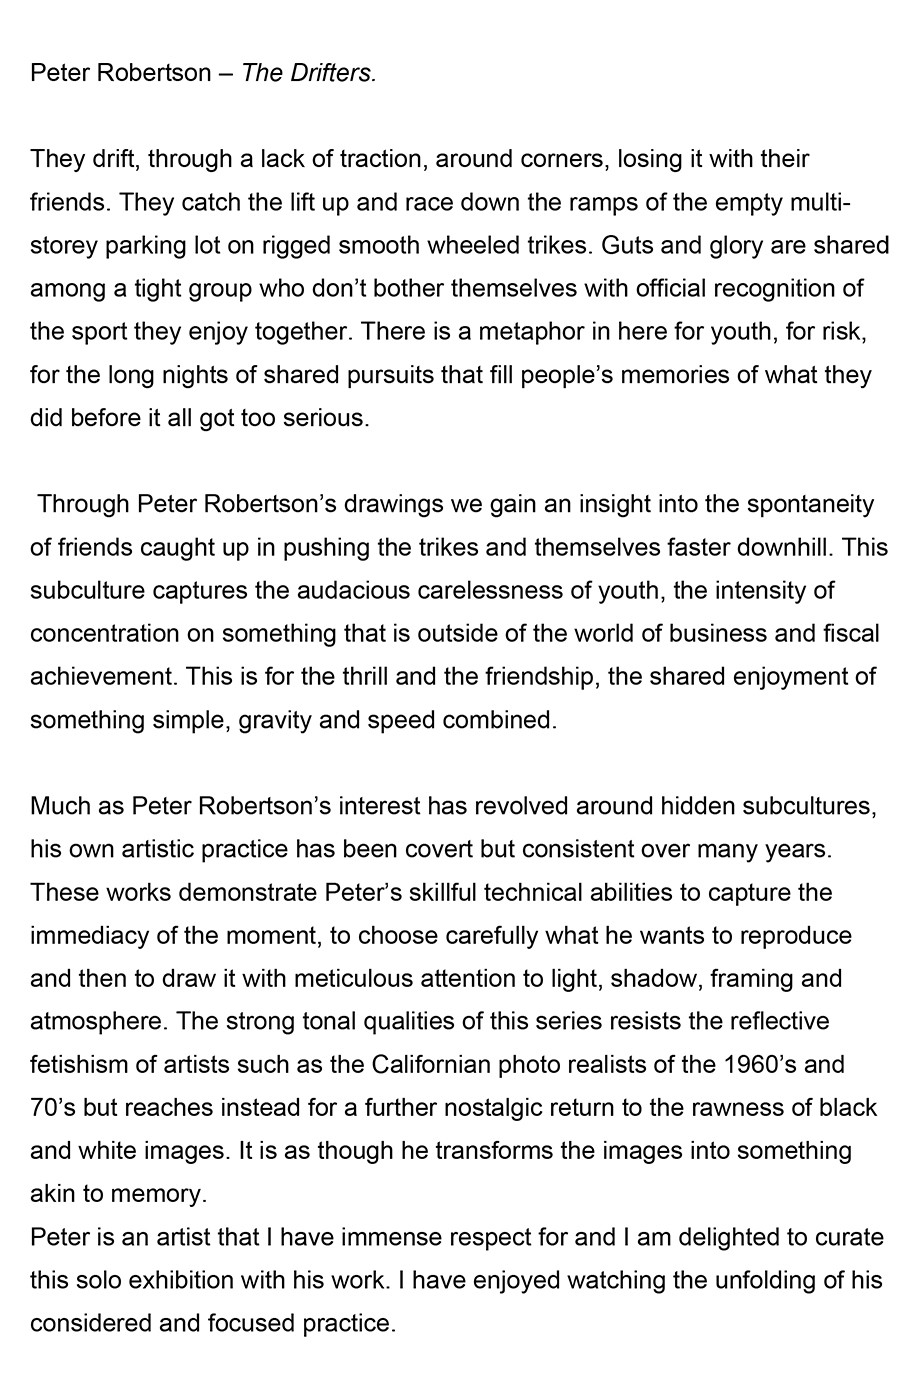 Victoria-Hobday-Curatorial-Text